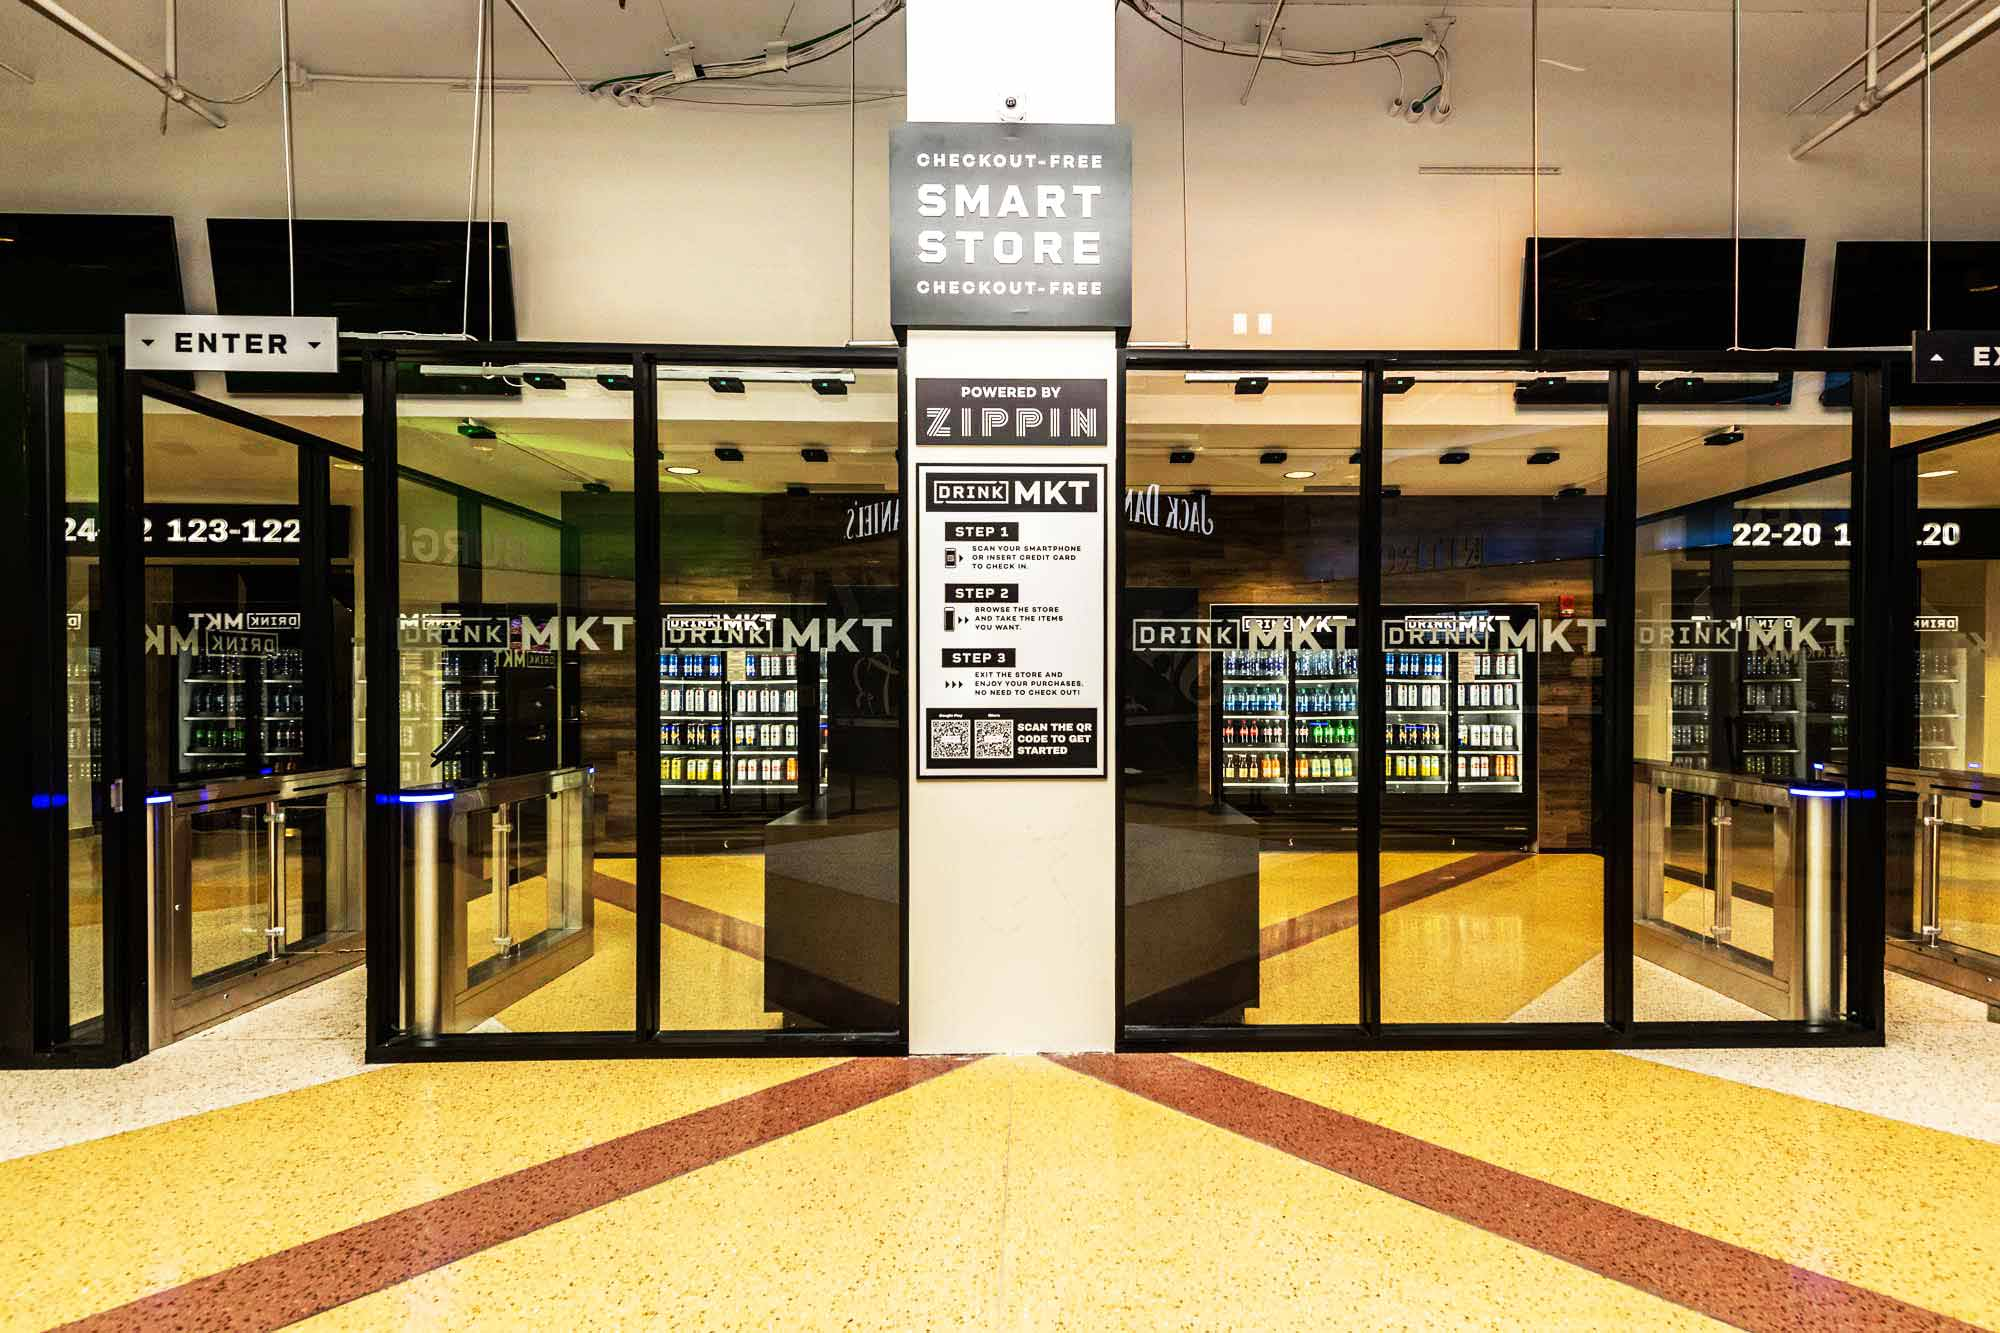 zippin checkout-free smart store